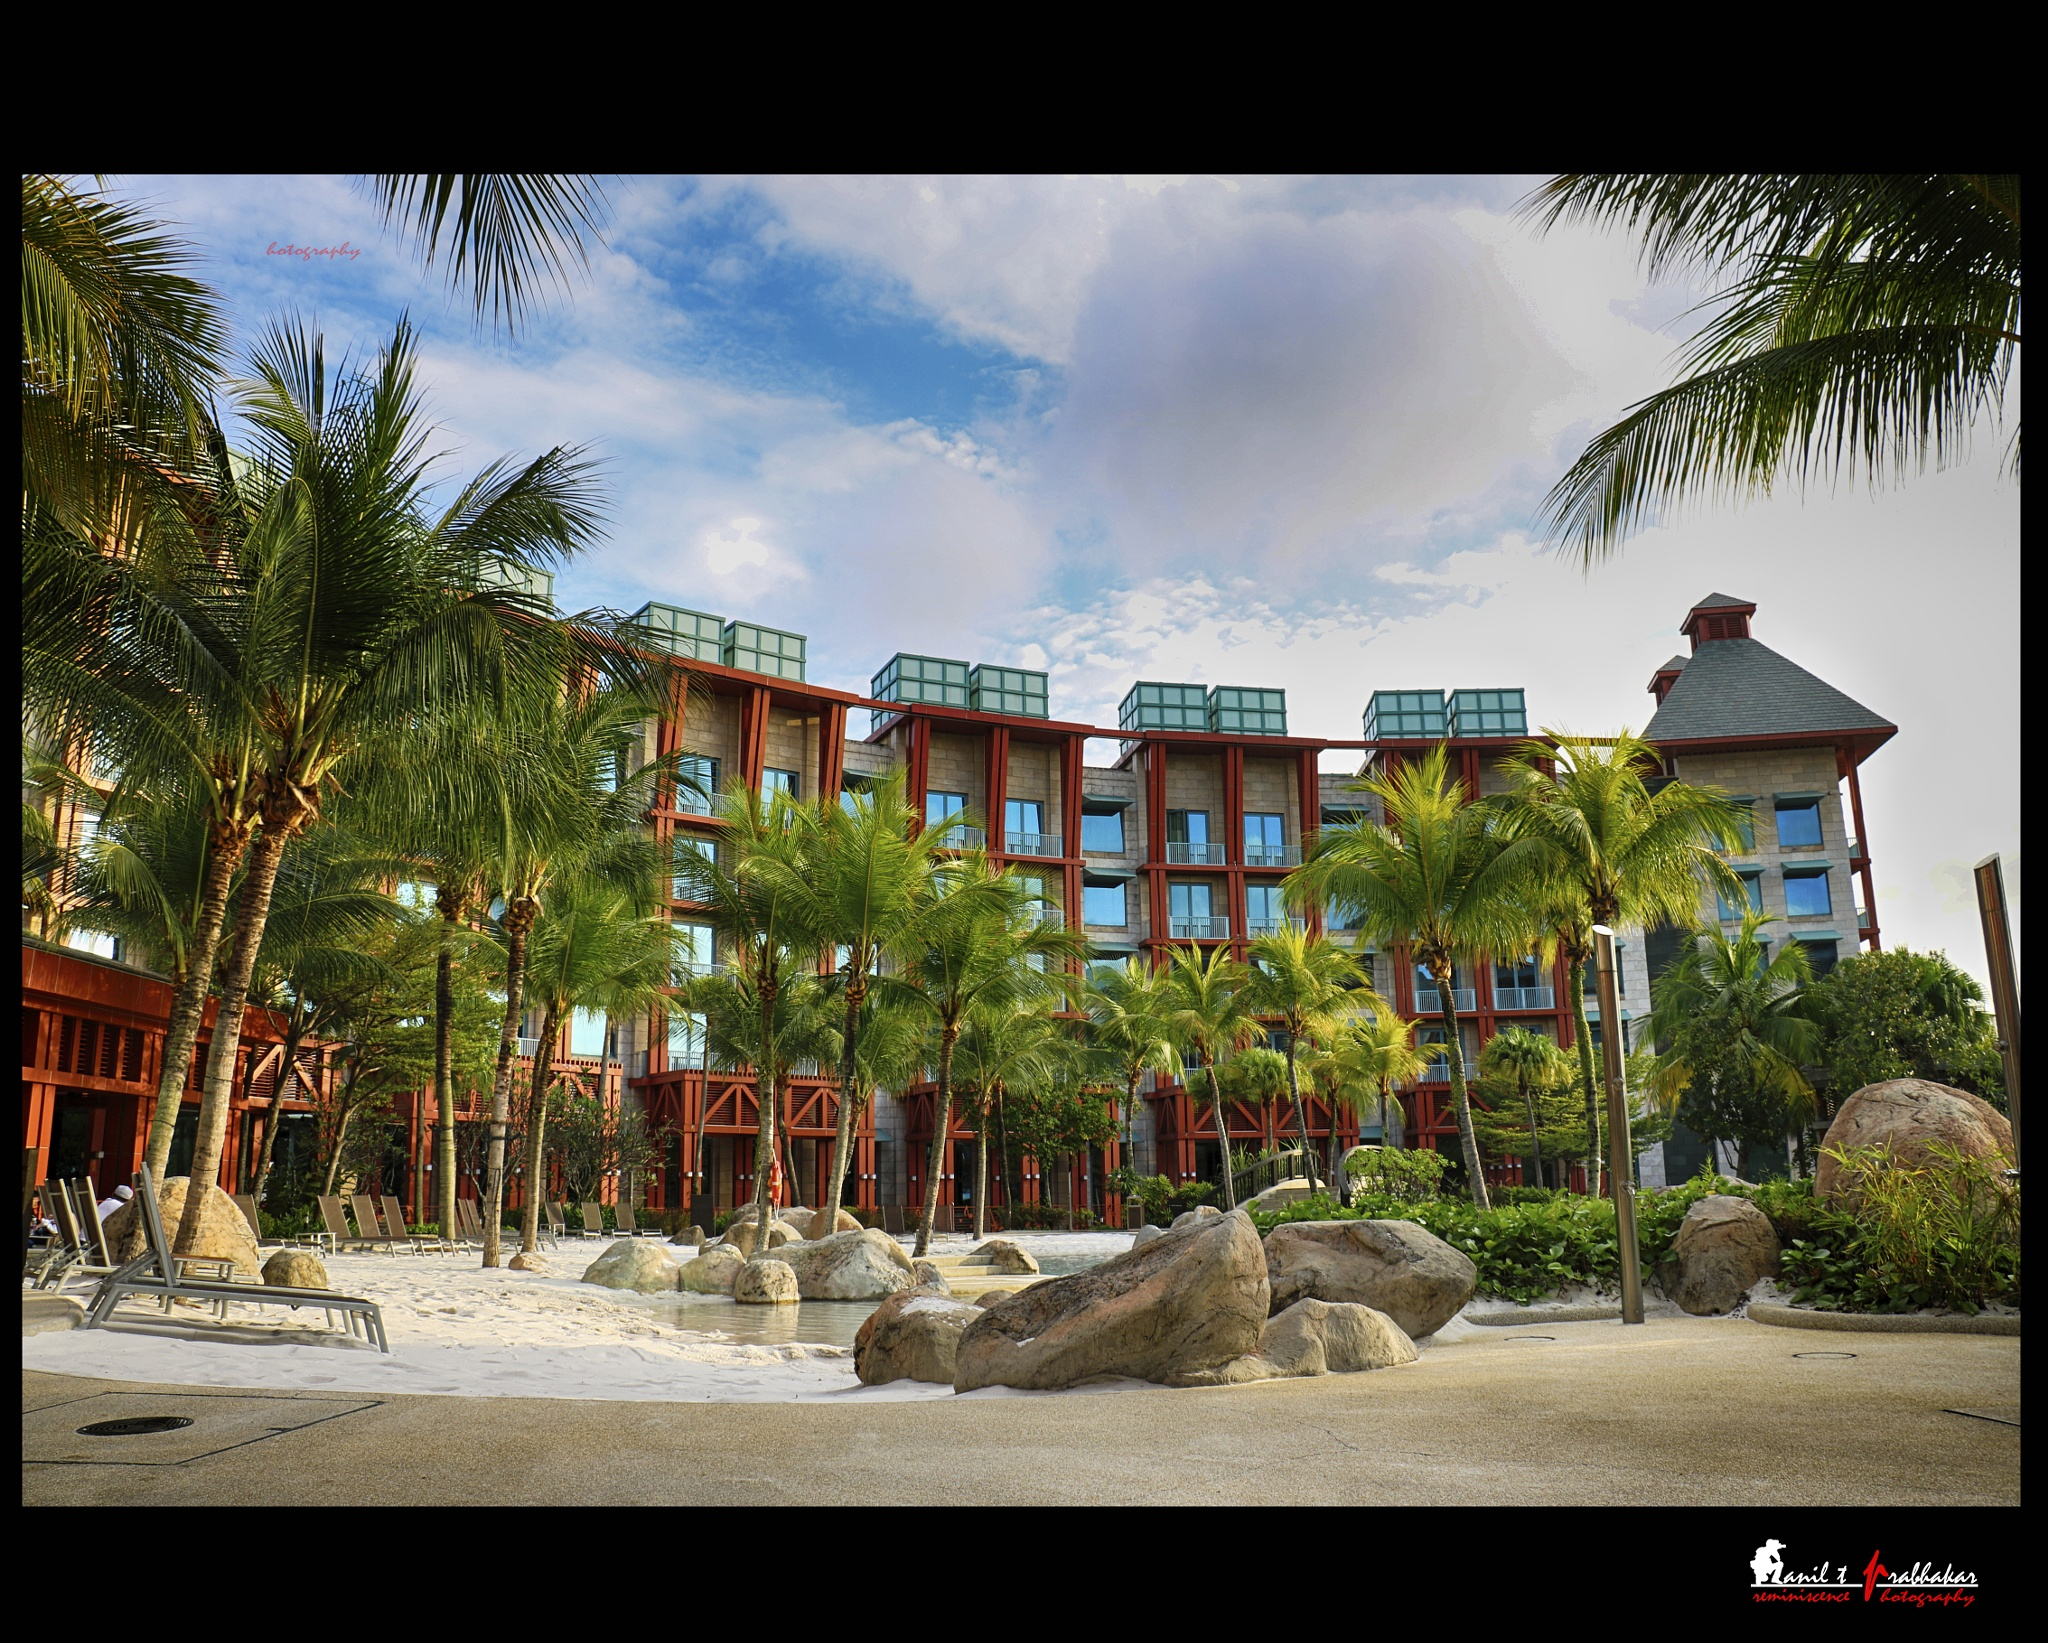 Hard Rock Hotel by Anil T Prabhakar